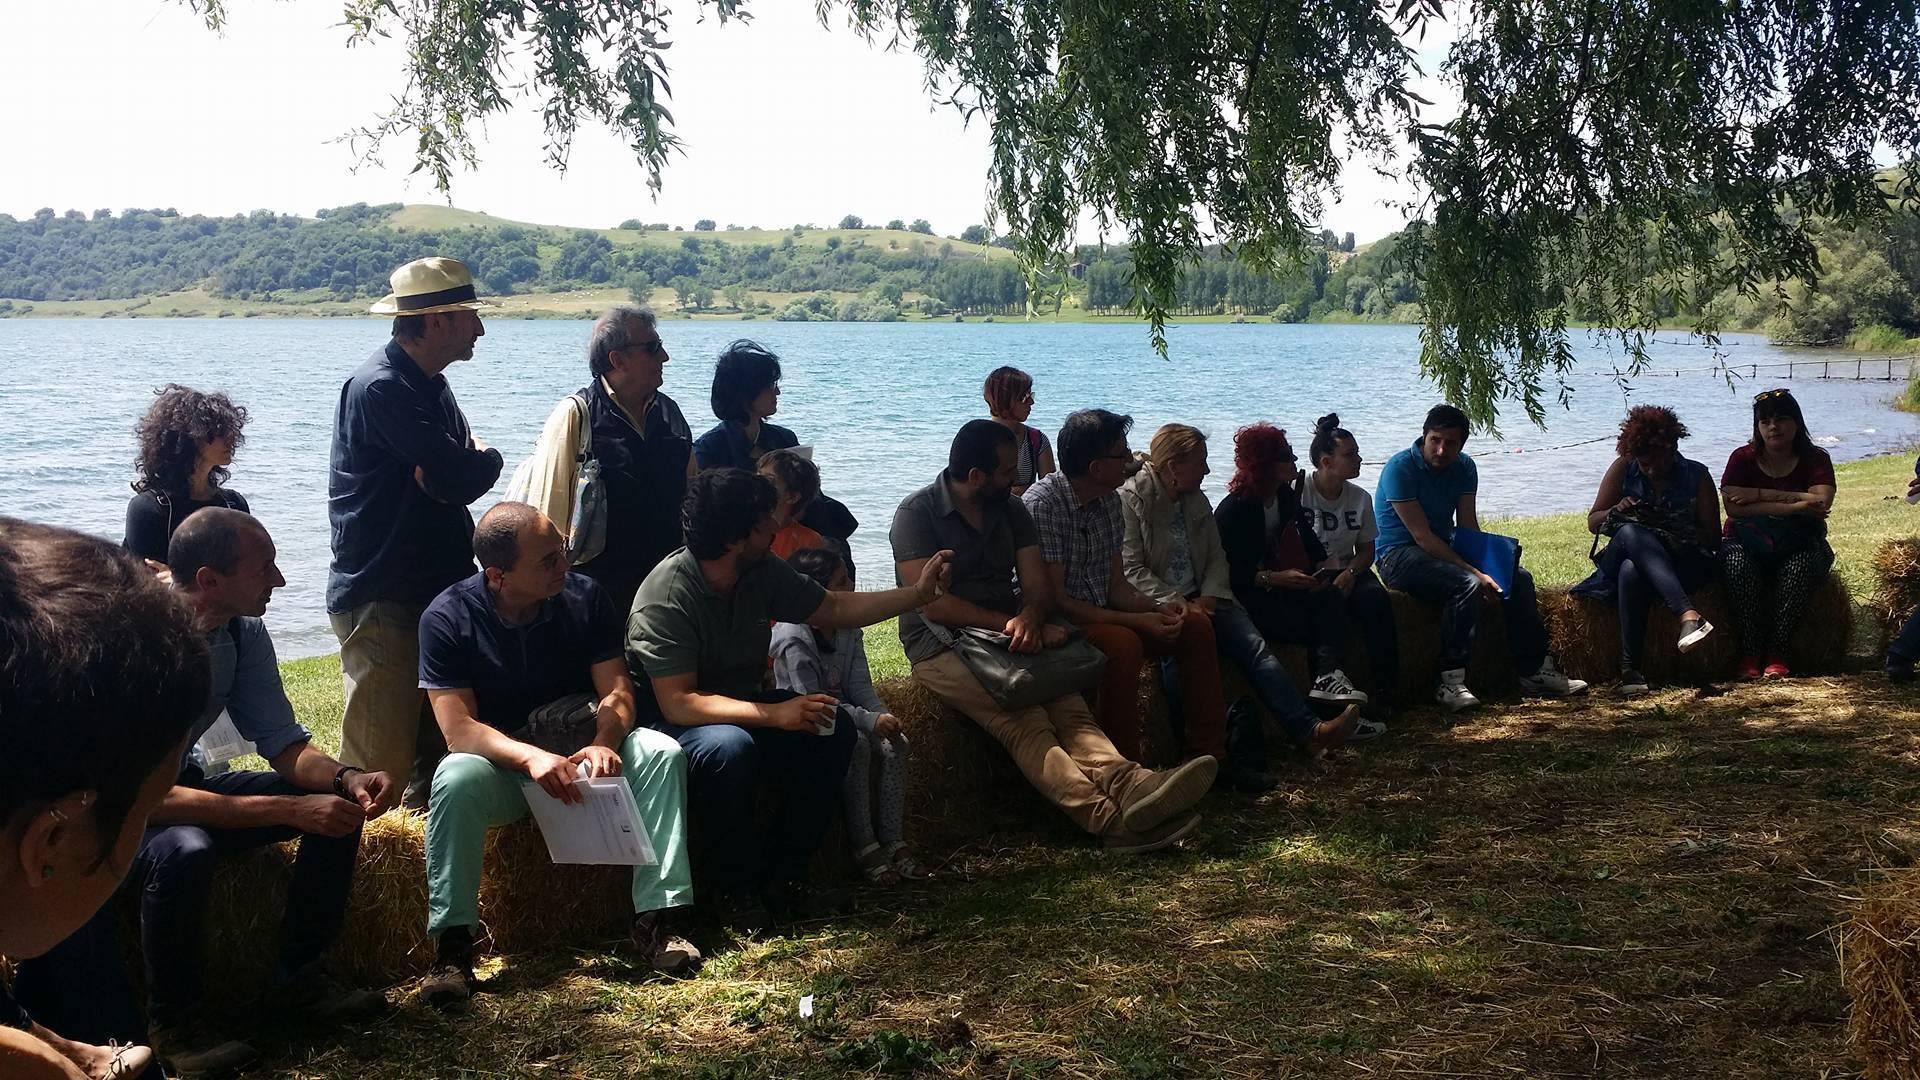 Campi aperti - Workshop su agricoltura sociale